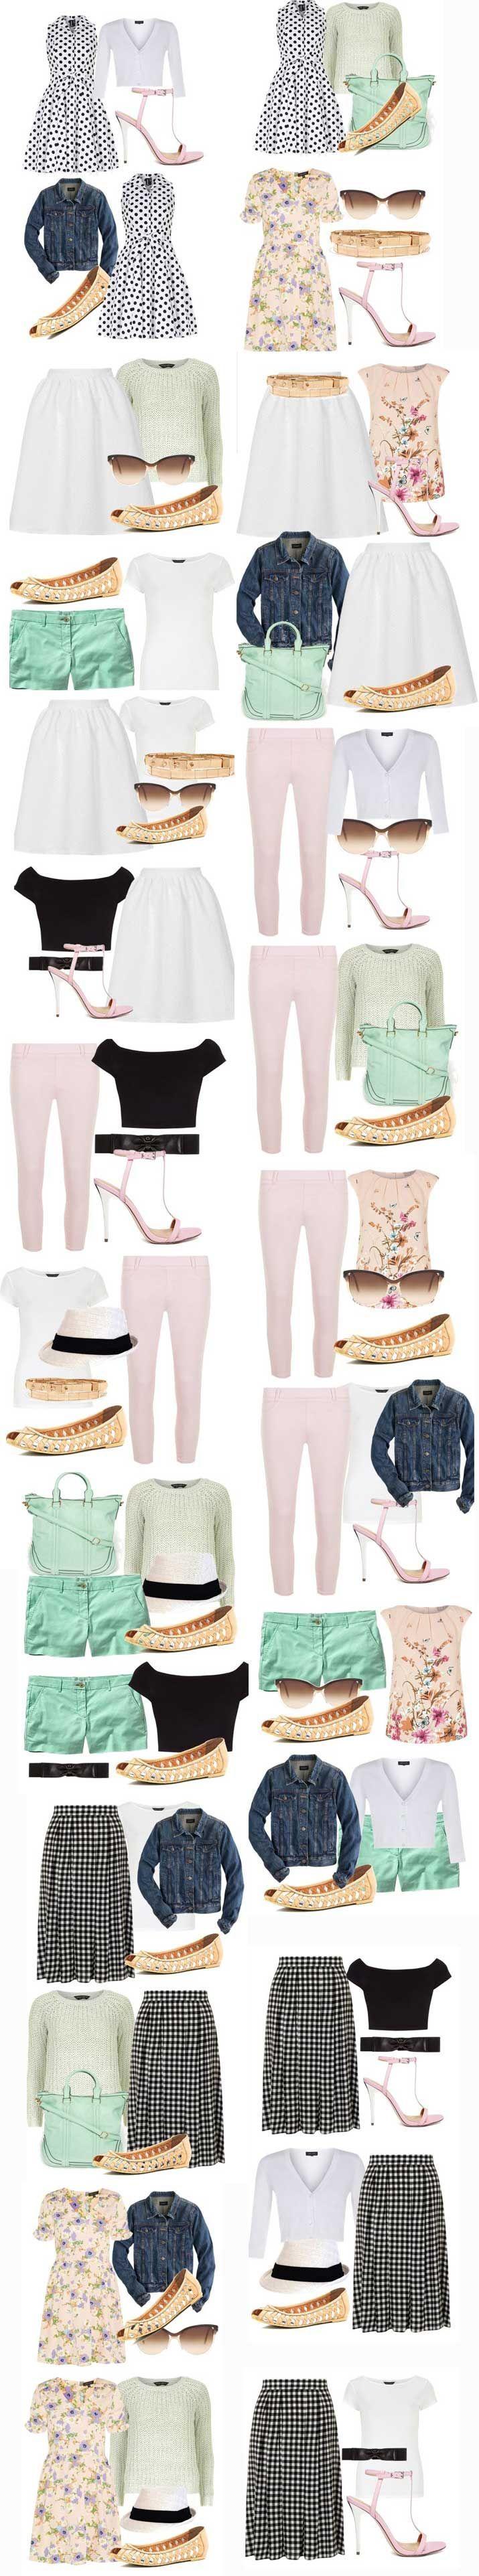 Summer Capsule Wardrobe: create a perfect capsule wardrobe Shoeperwoman